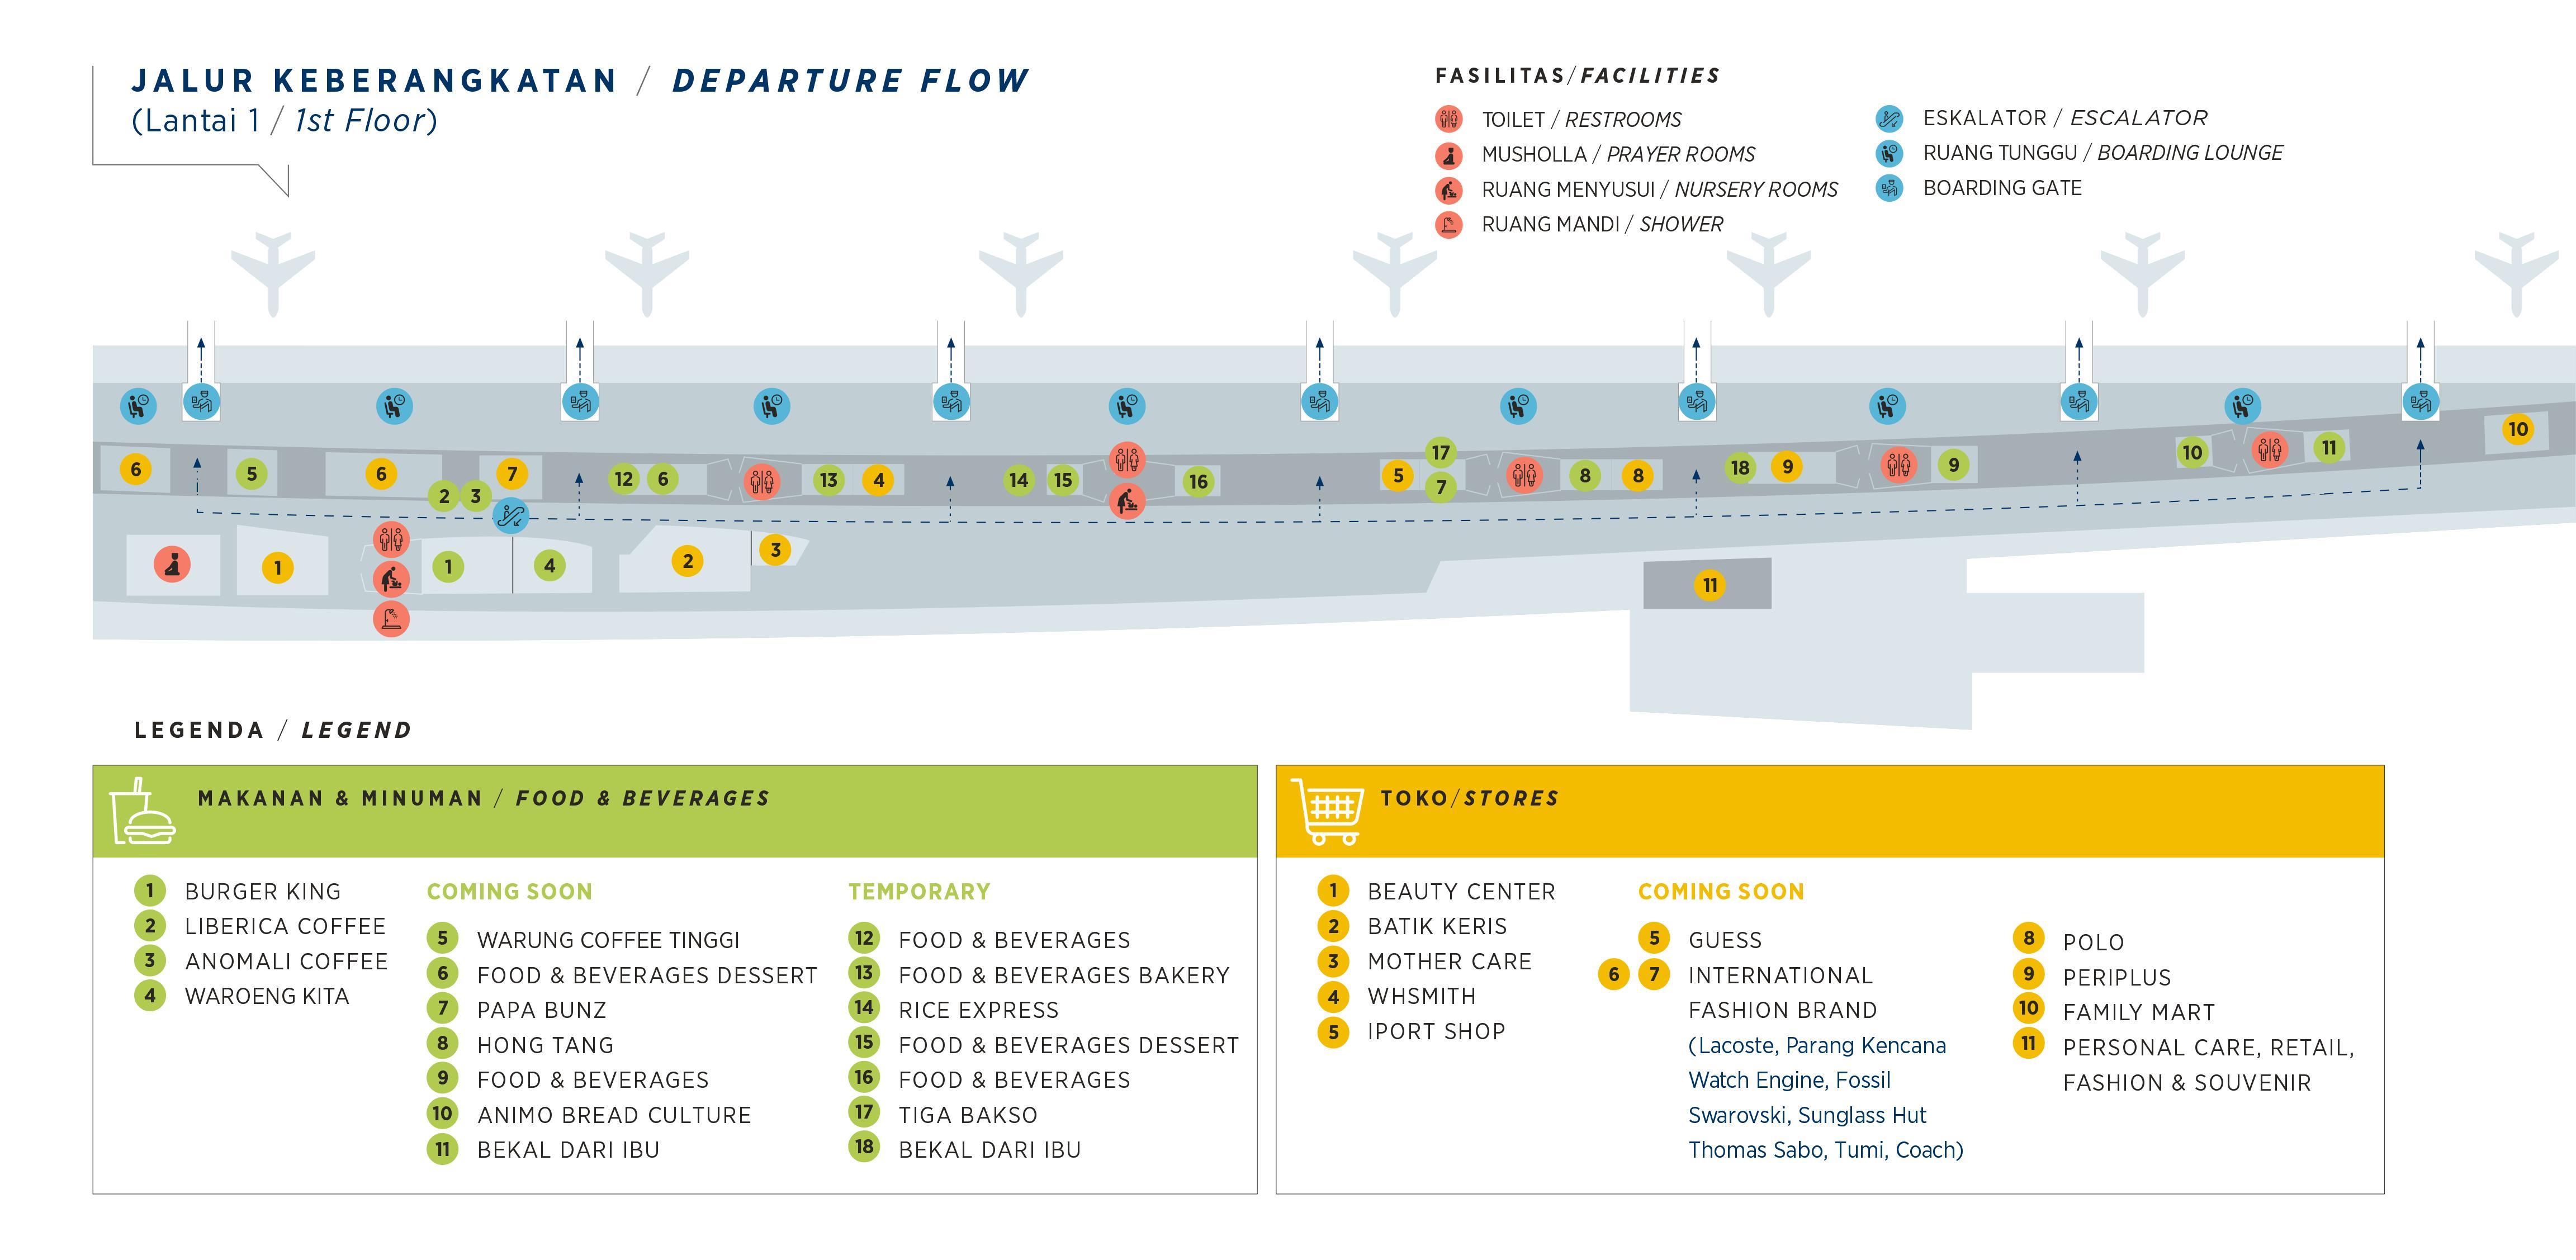 Peta Terminal 3 Bandara Soekarno Hatta I Notordinaryblogger